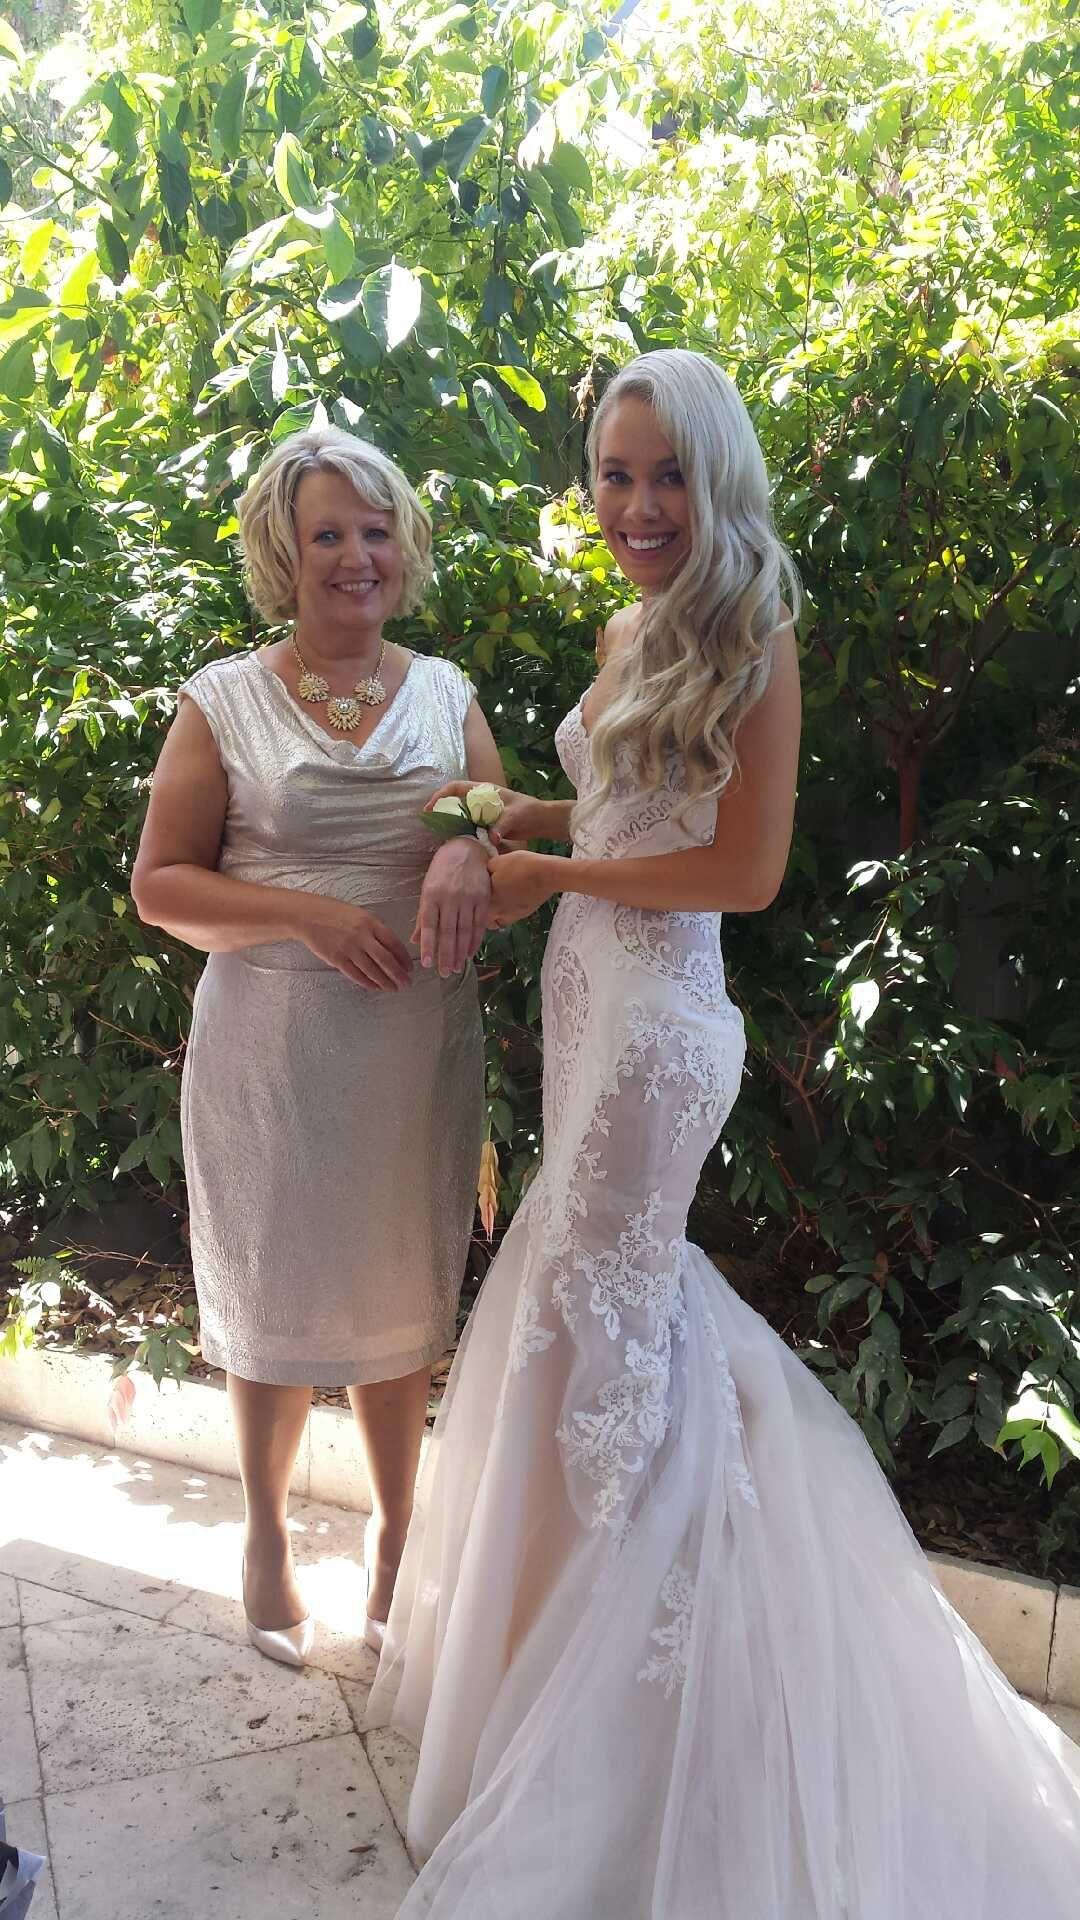 Steven Khalil Custom Made Wedding Dress Wedding Dresses Second Hand Wedding Dresses Steven Khalil Wedding Dress